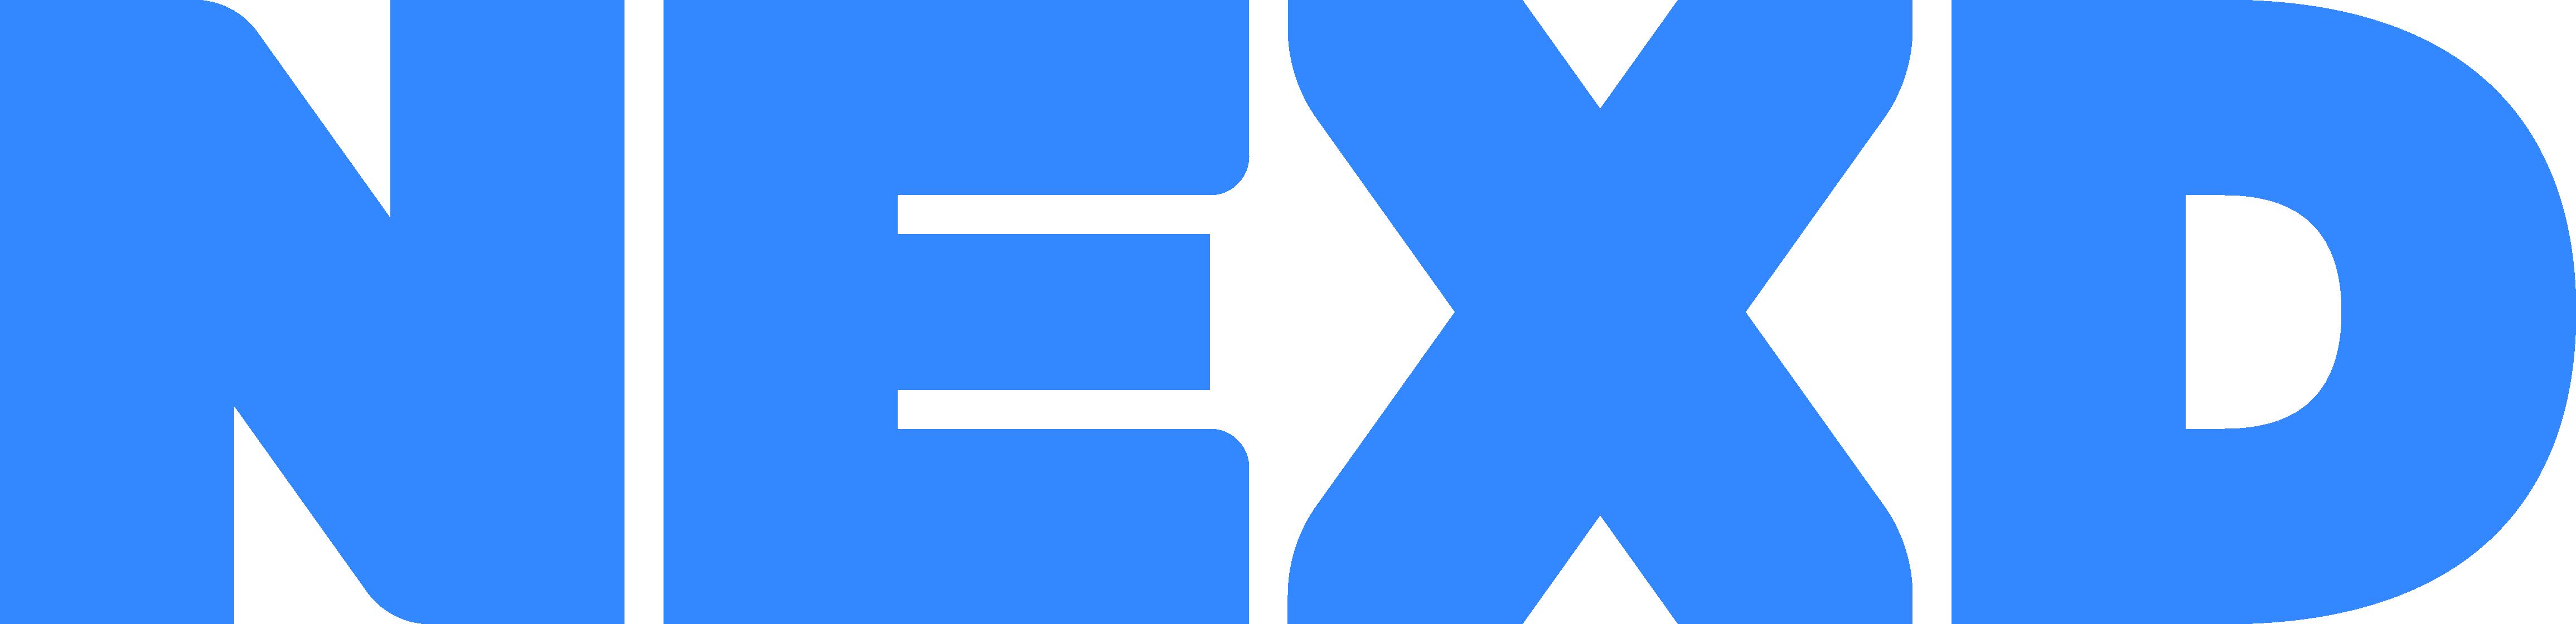 NEXD Logo